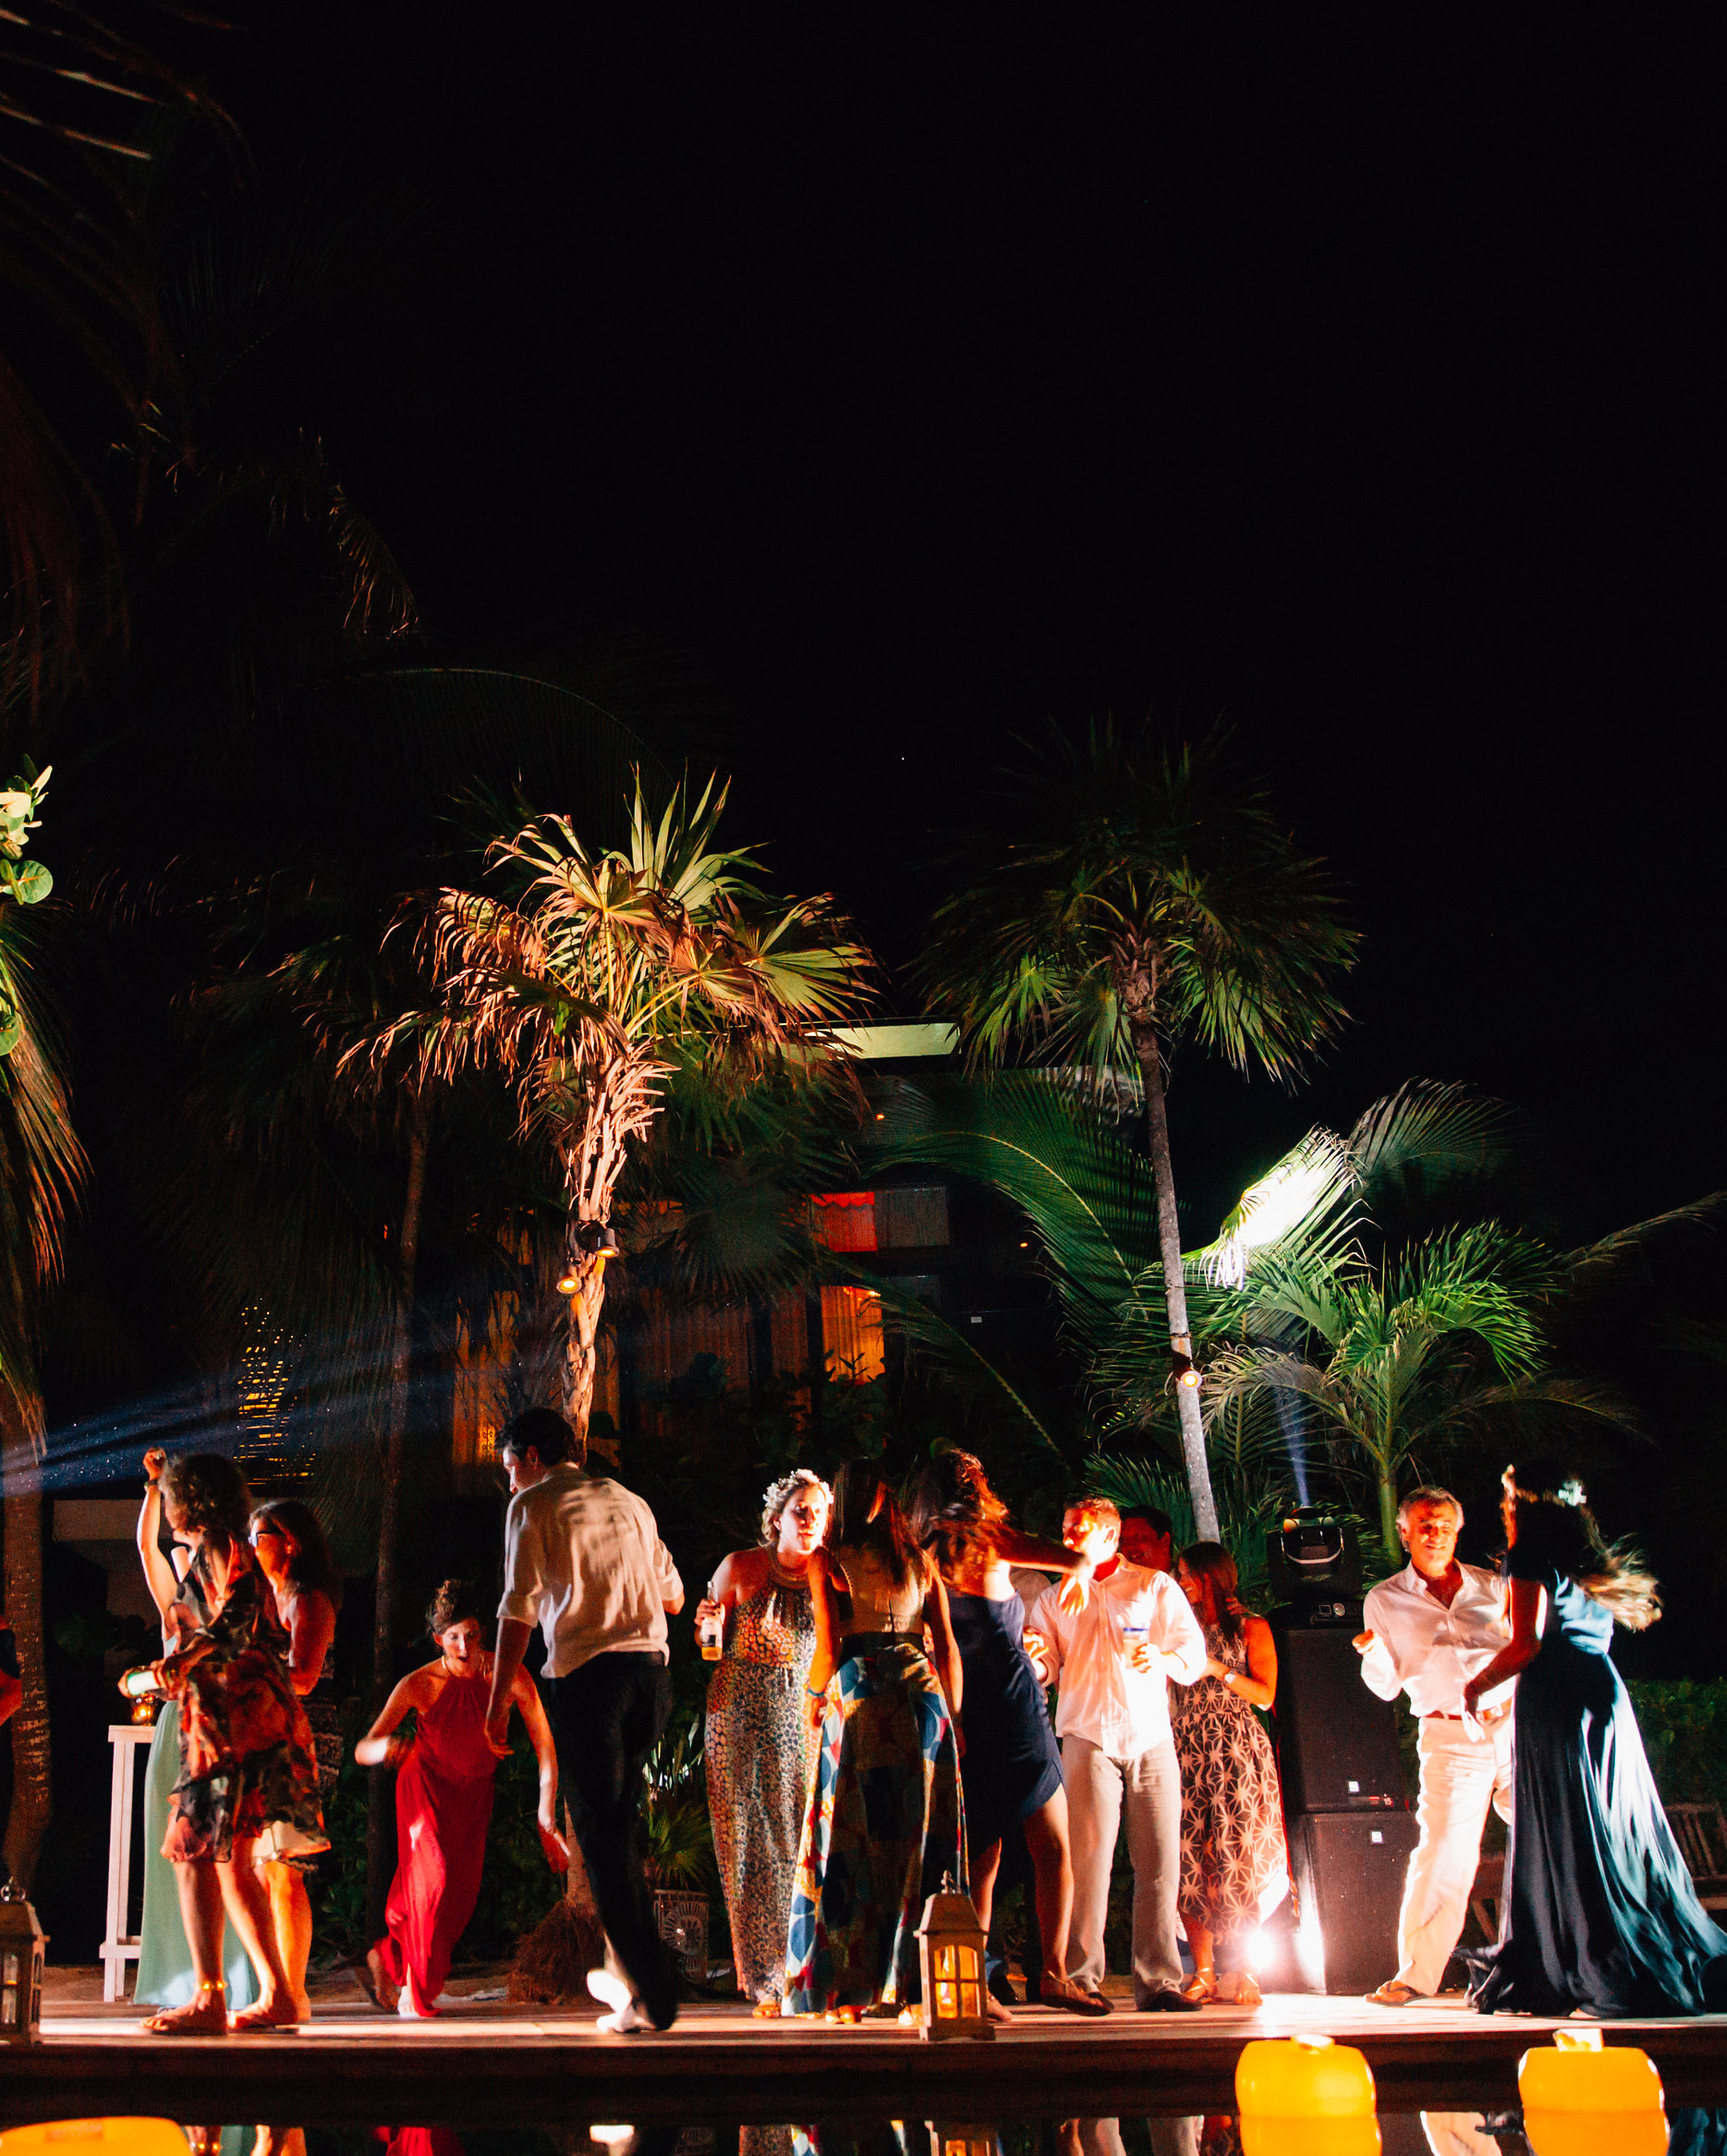 olivia-keith-wedding-dancing-129-s112304-0815.jpg